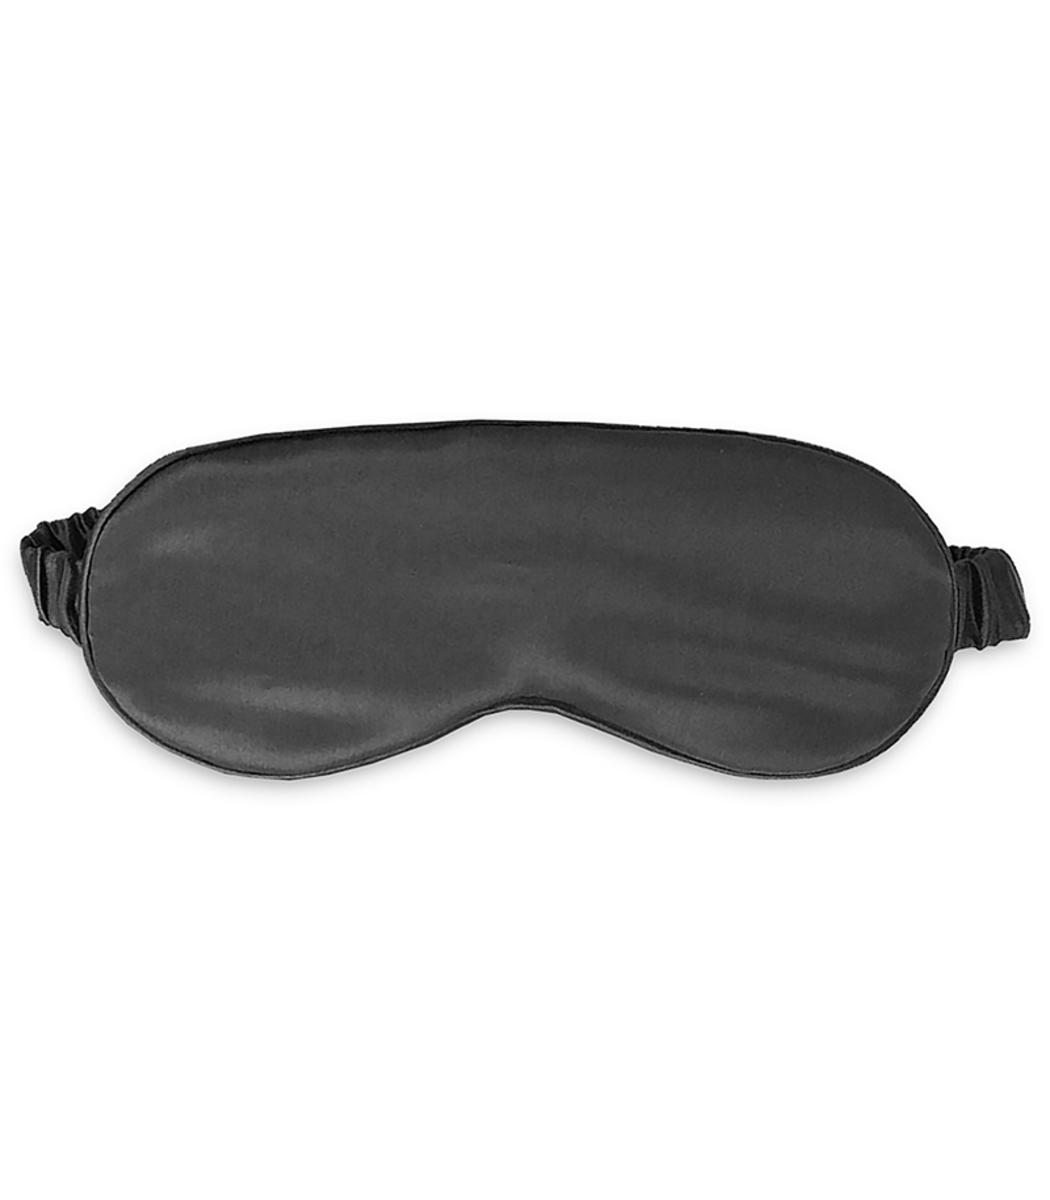 SLIP Charcoal Silk Sleep Mask